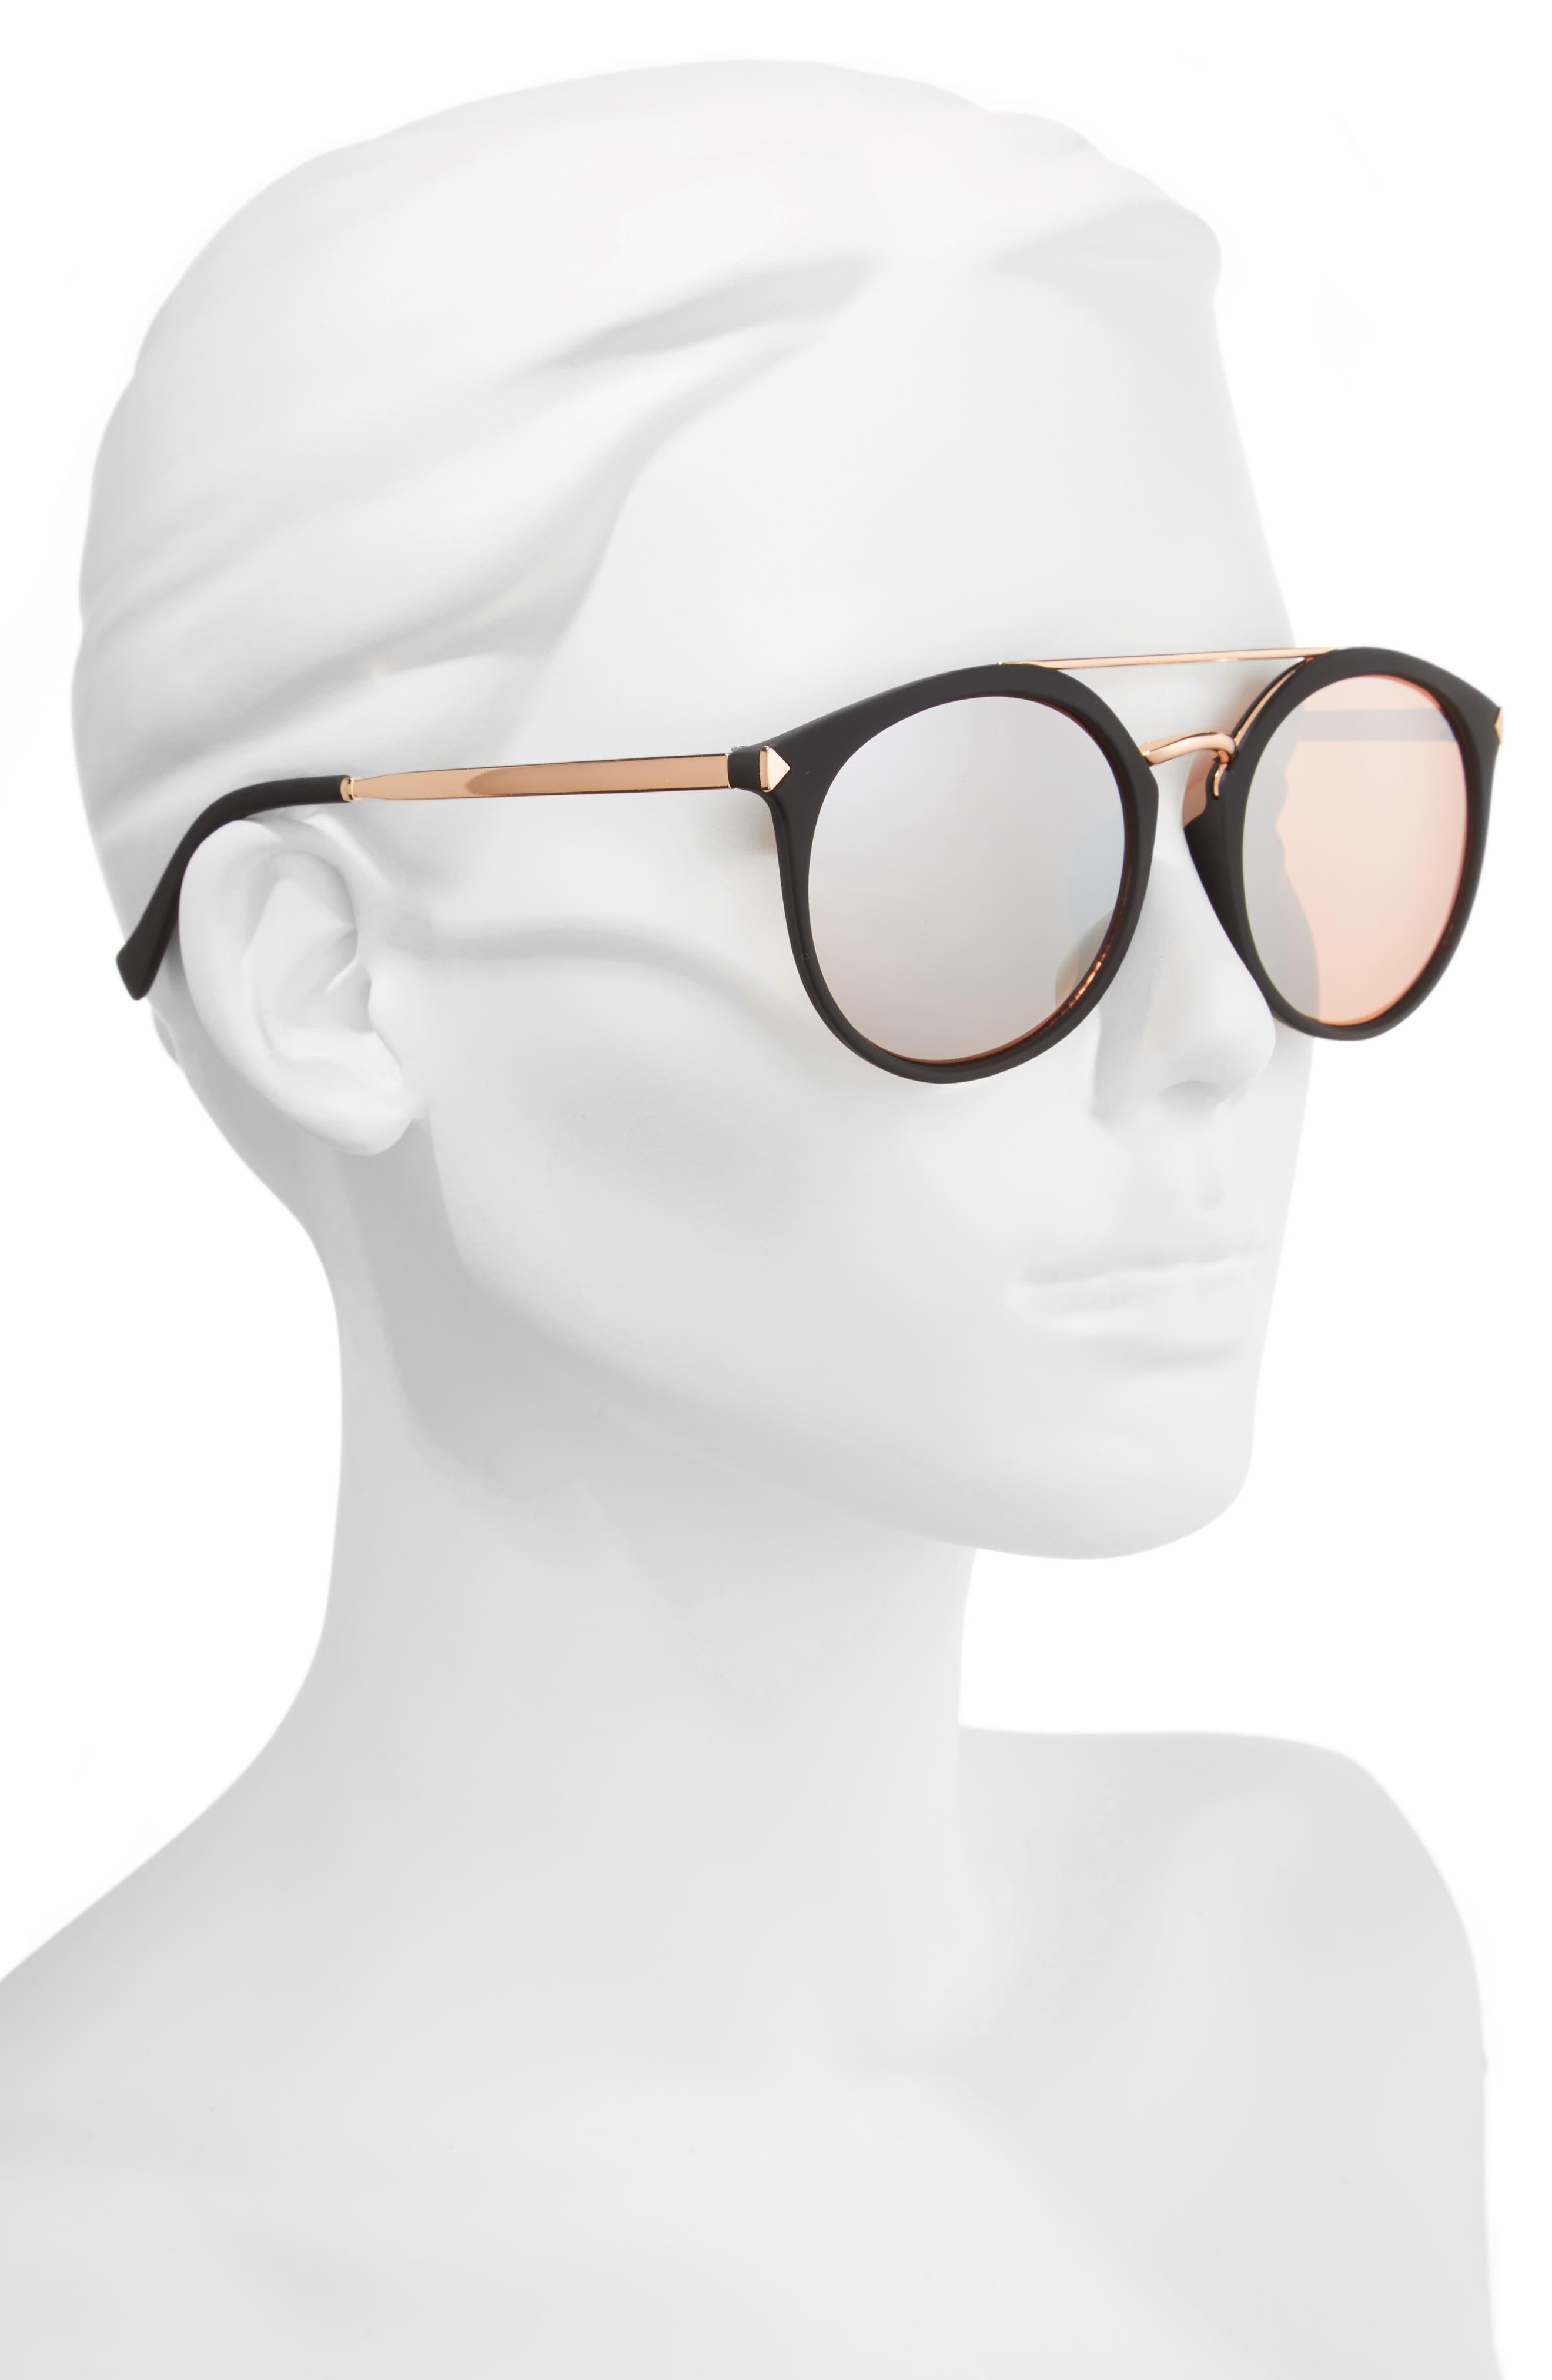 55mm Mirrored Sunglasses,                             Alternate thumbnail 2, color,                             Black/ Rose Gold